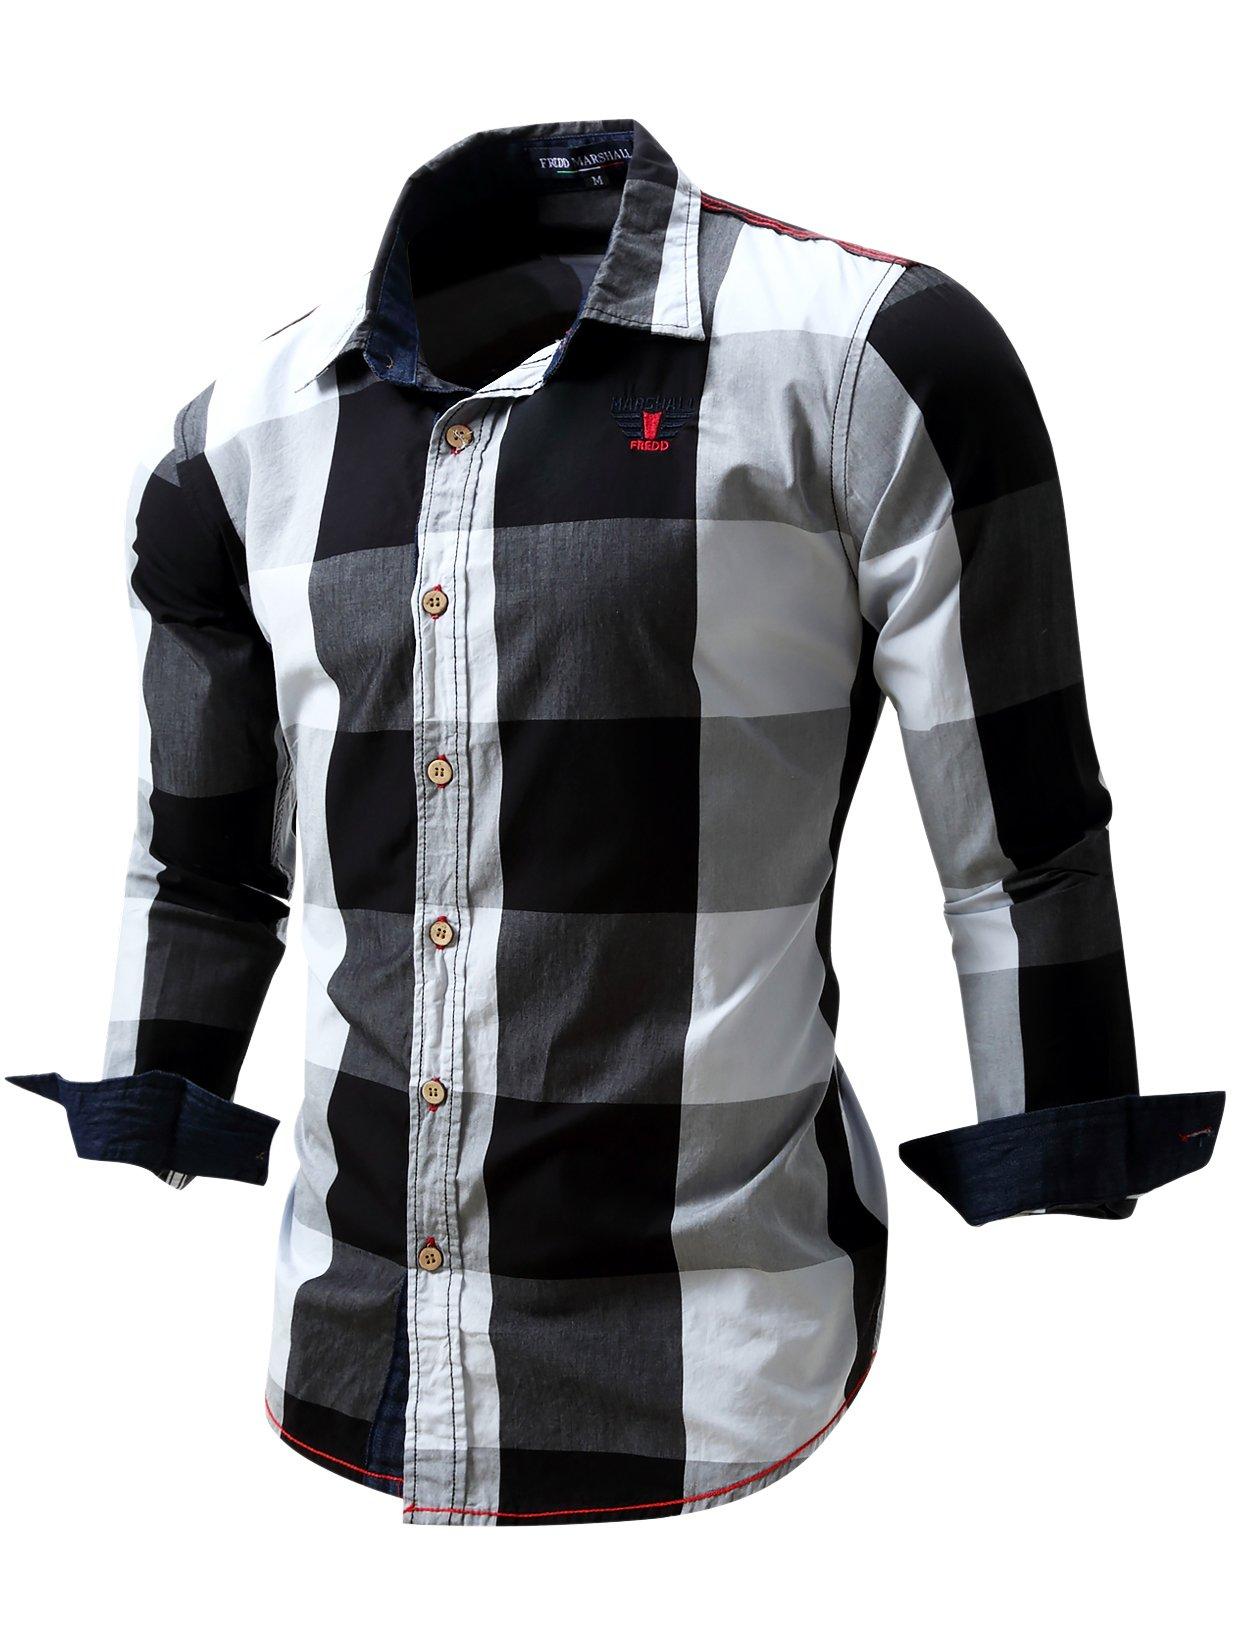 Neleus Men's Long Sleeve Button Down Plaid Shirts,112,Black,XL,EUR Tag 3XL